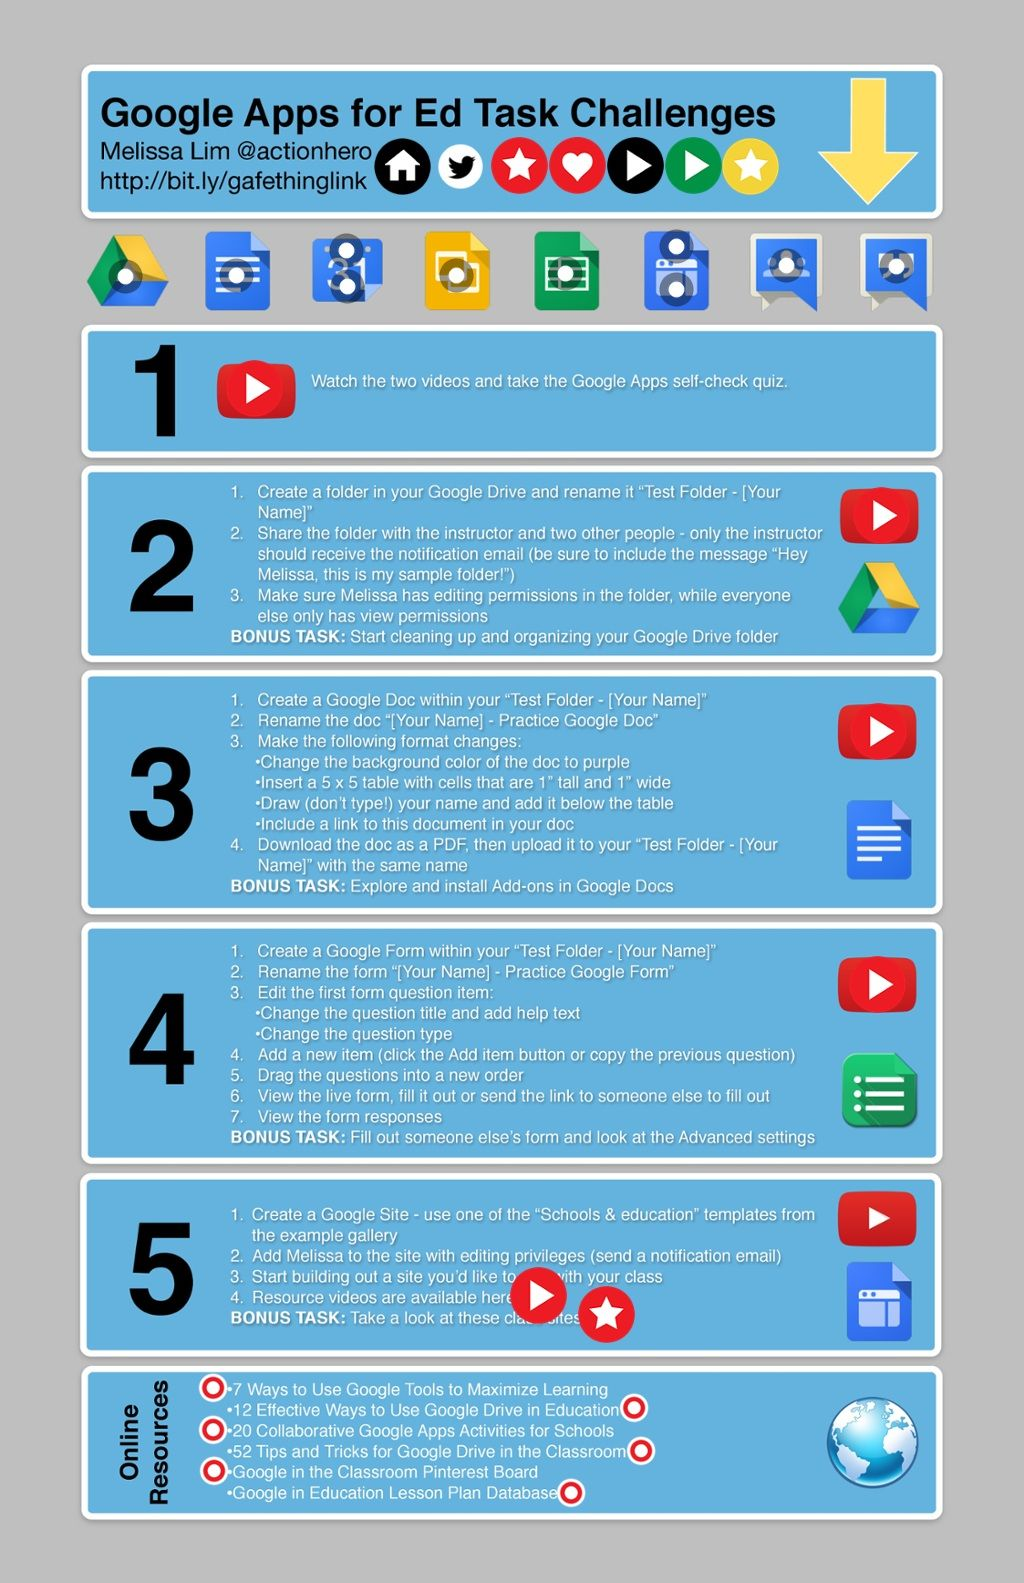 Google Apps For Ed Task Challenges By Melissa Lim Google Apps App Google